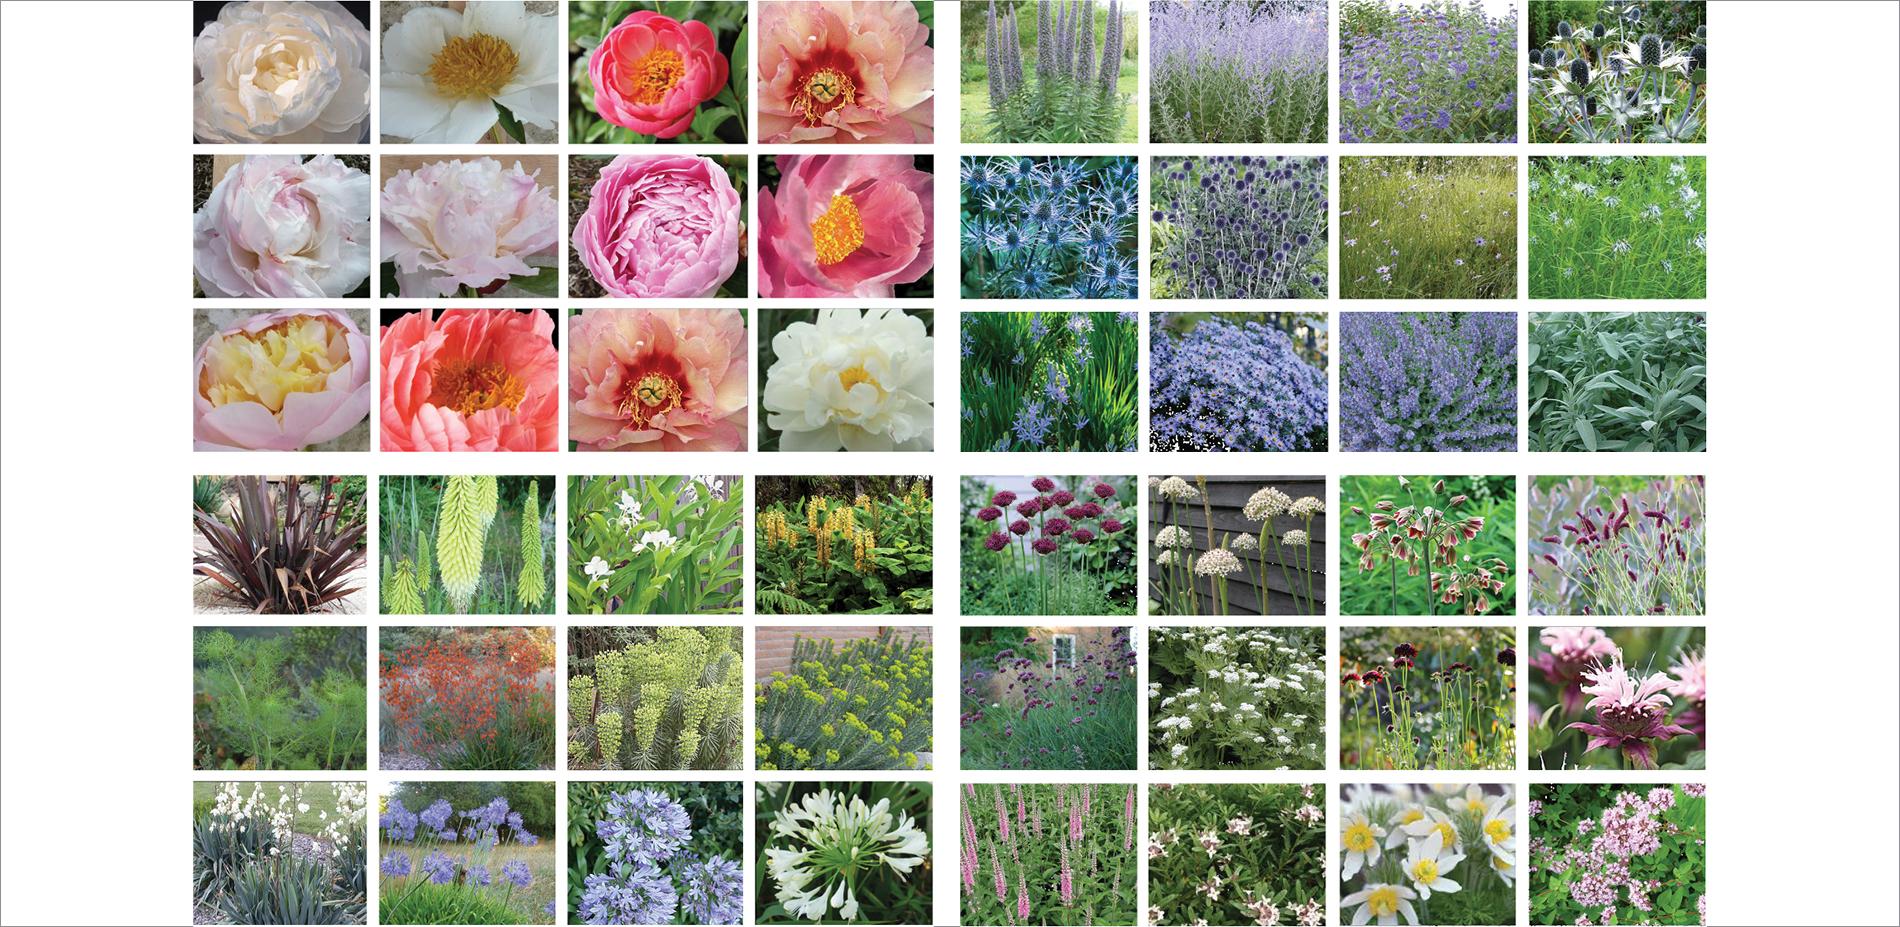 FLOWERS OF MASHCOURT